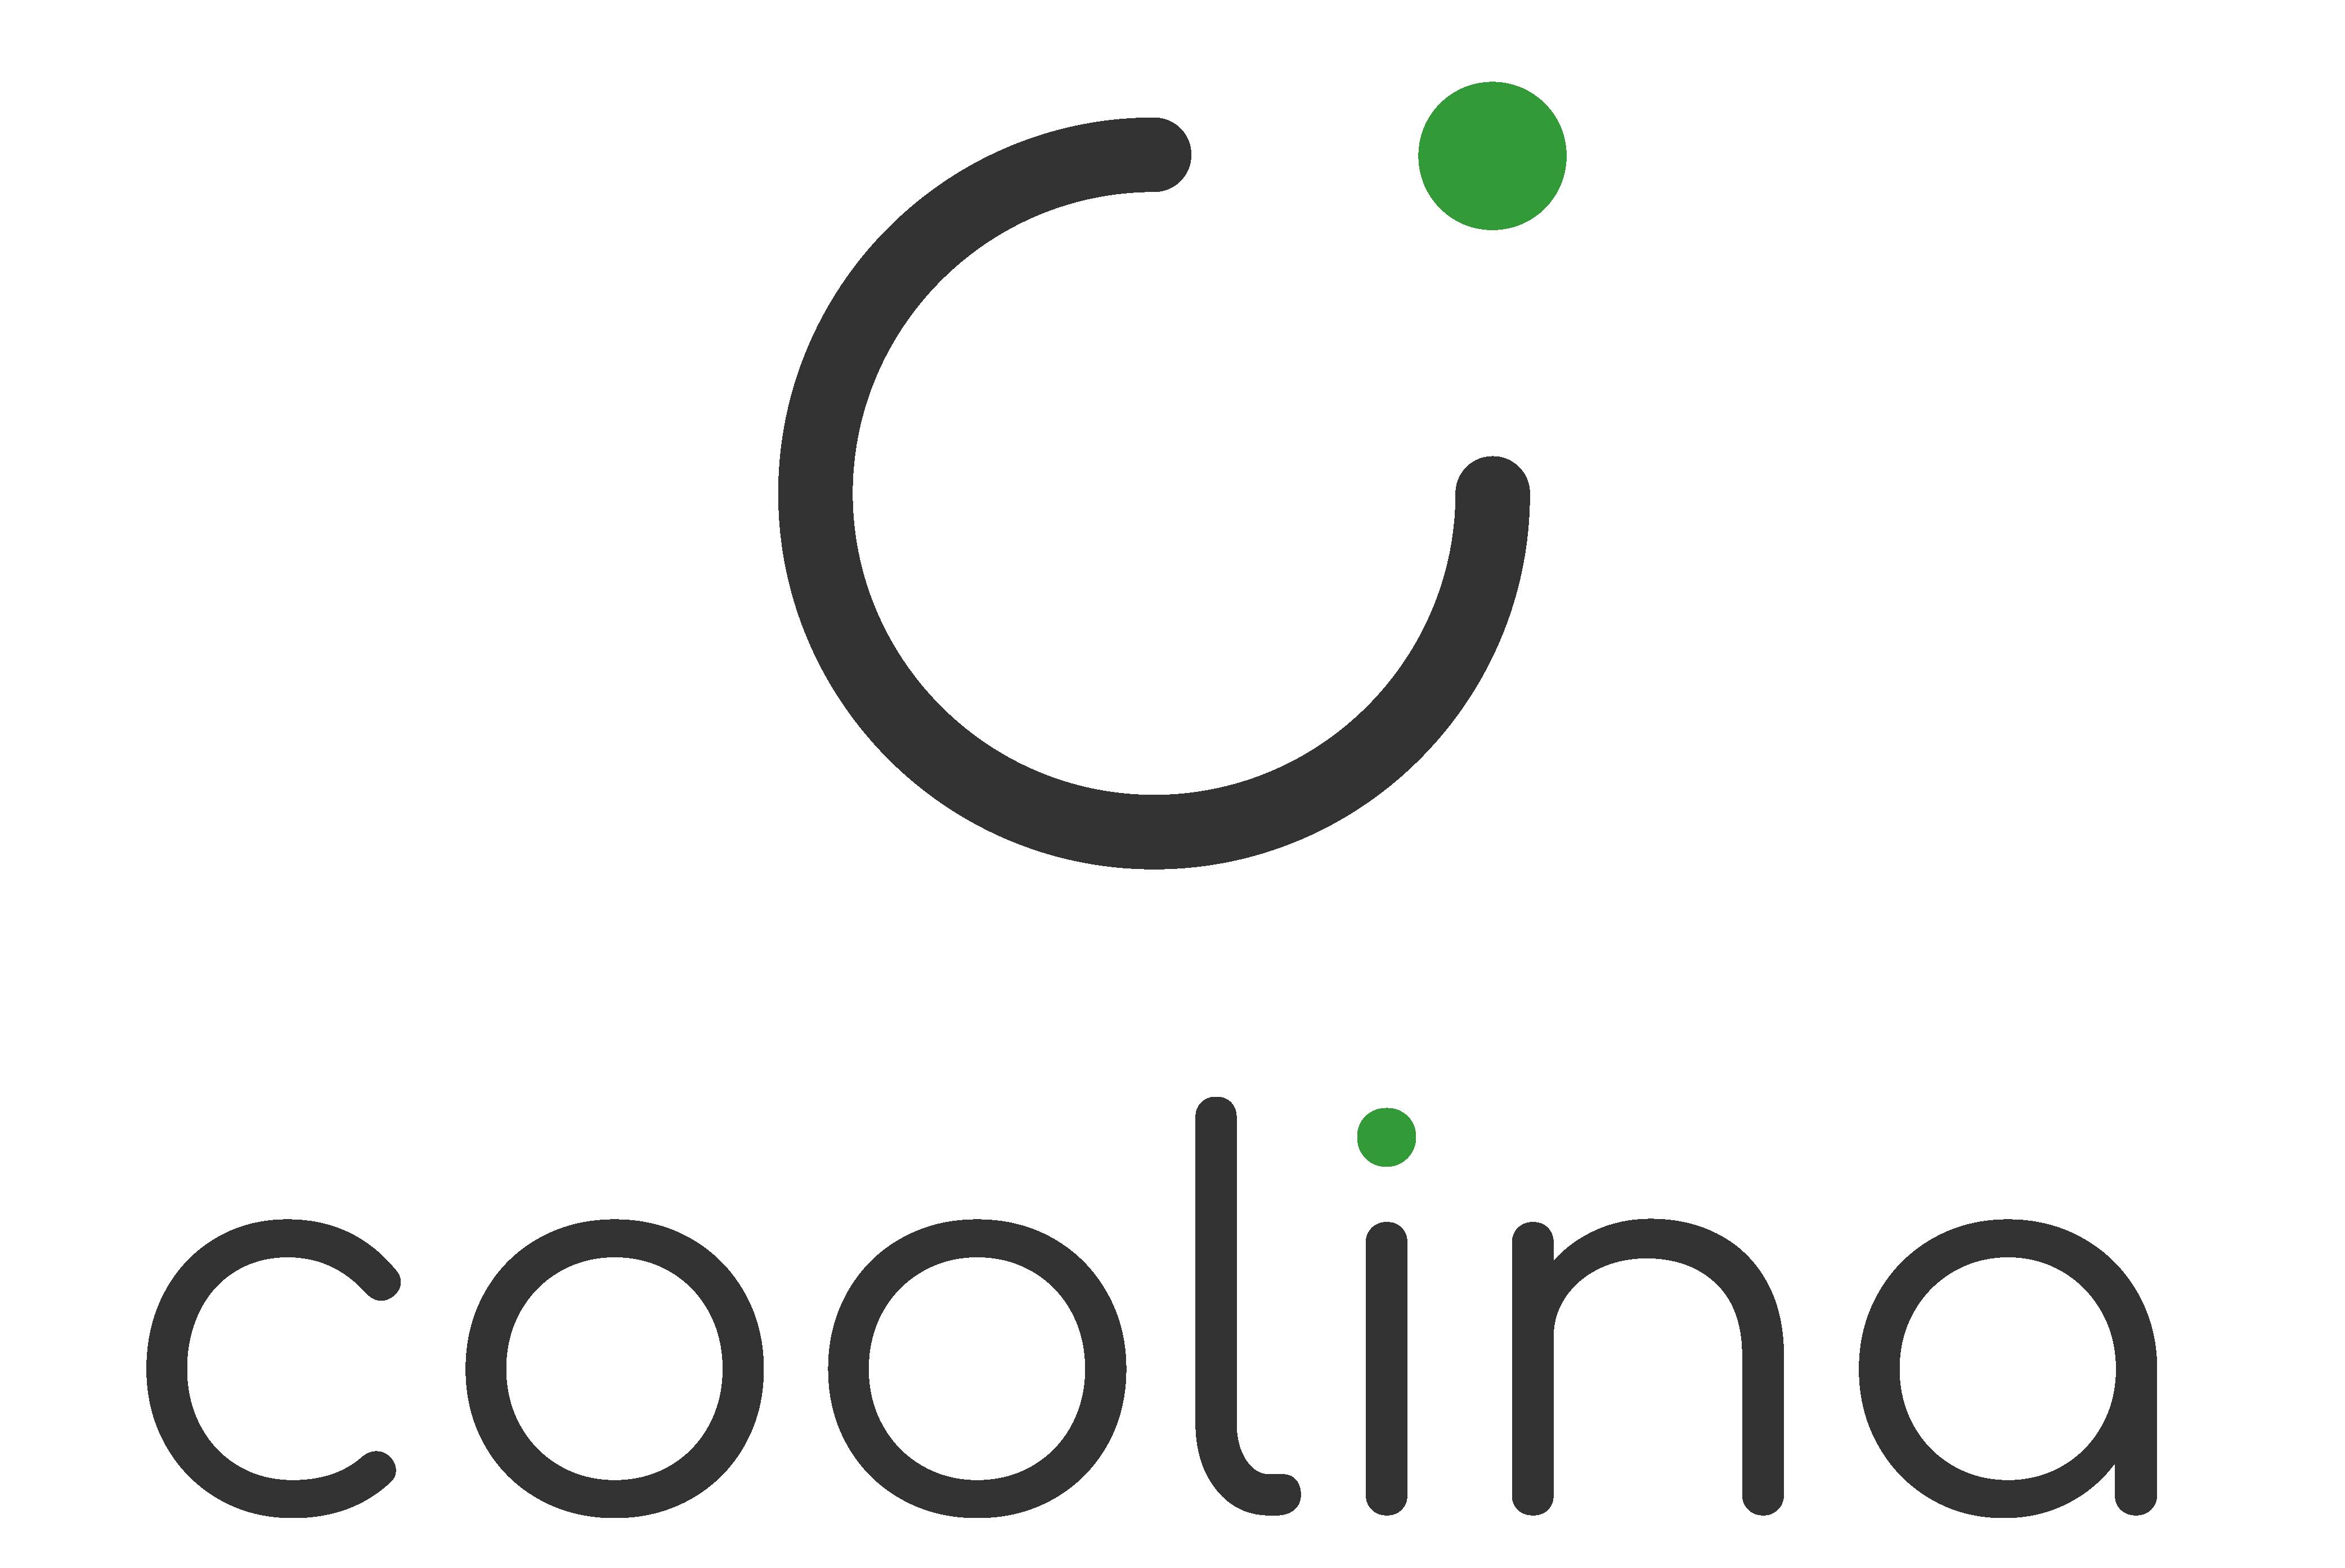 coolina